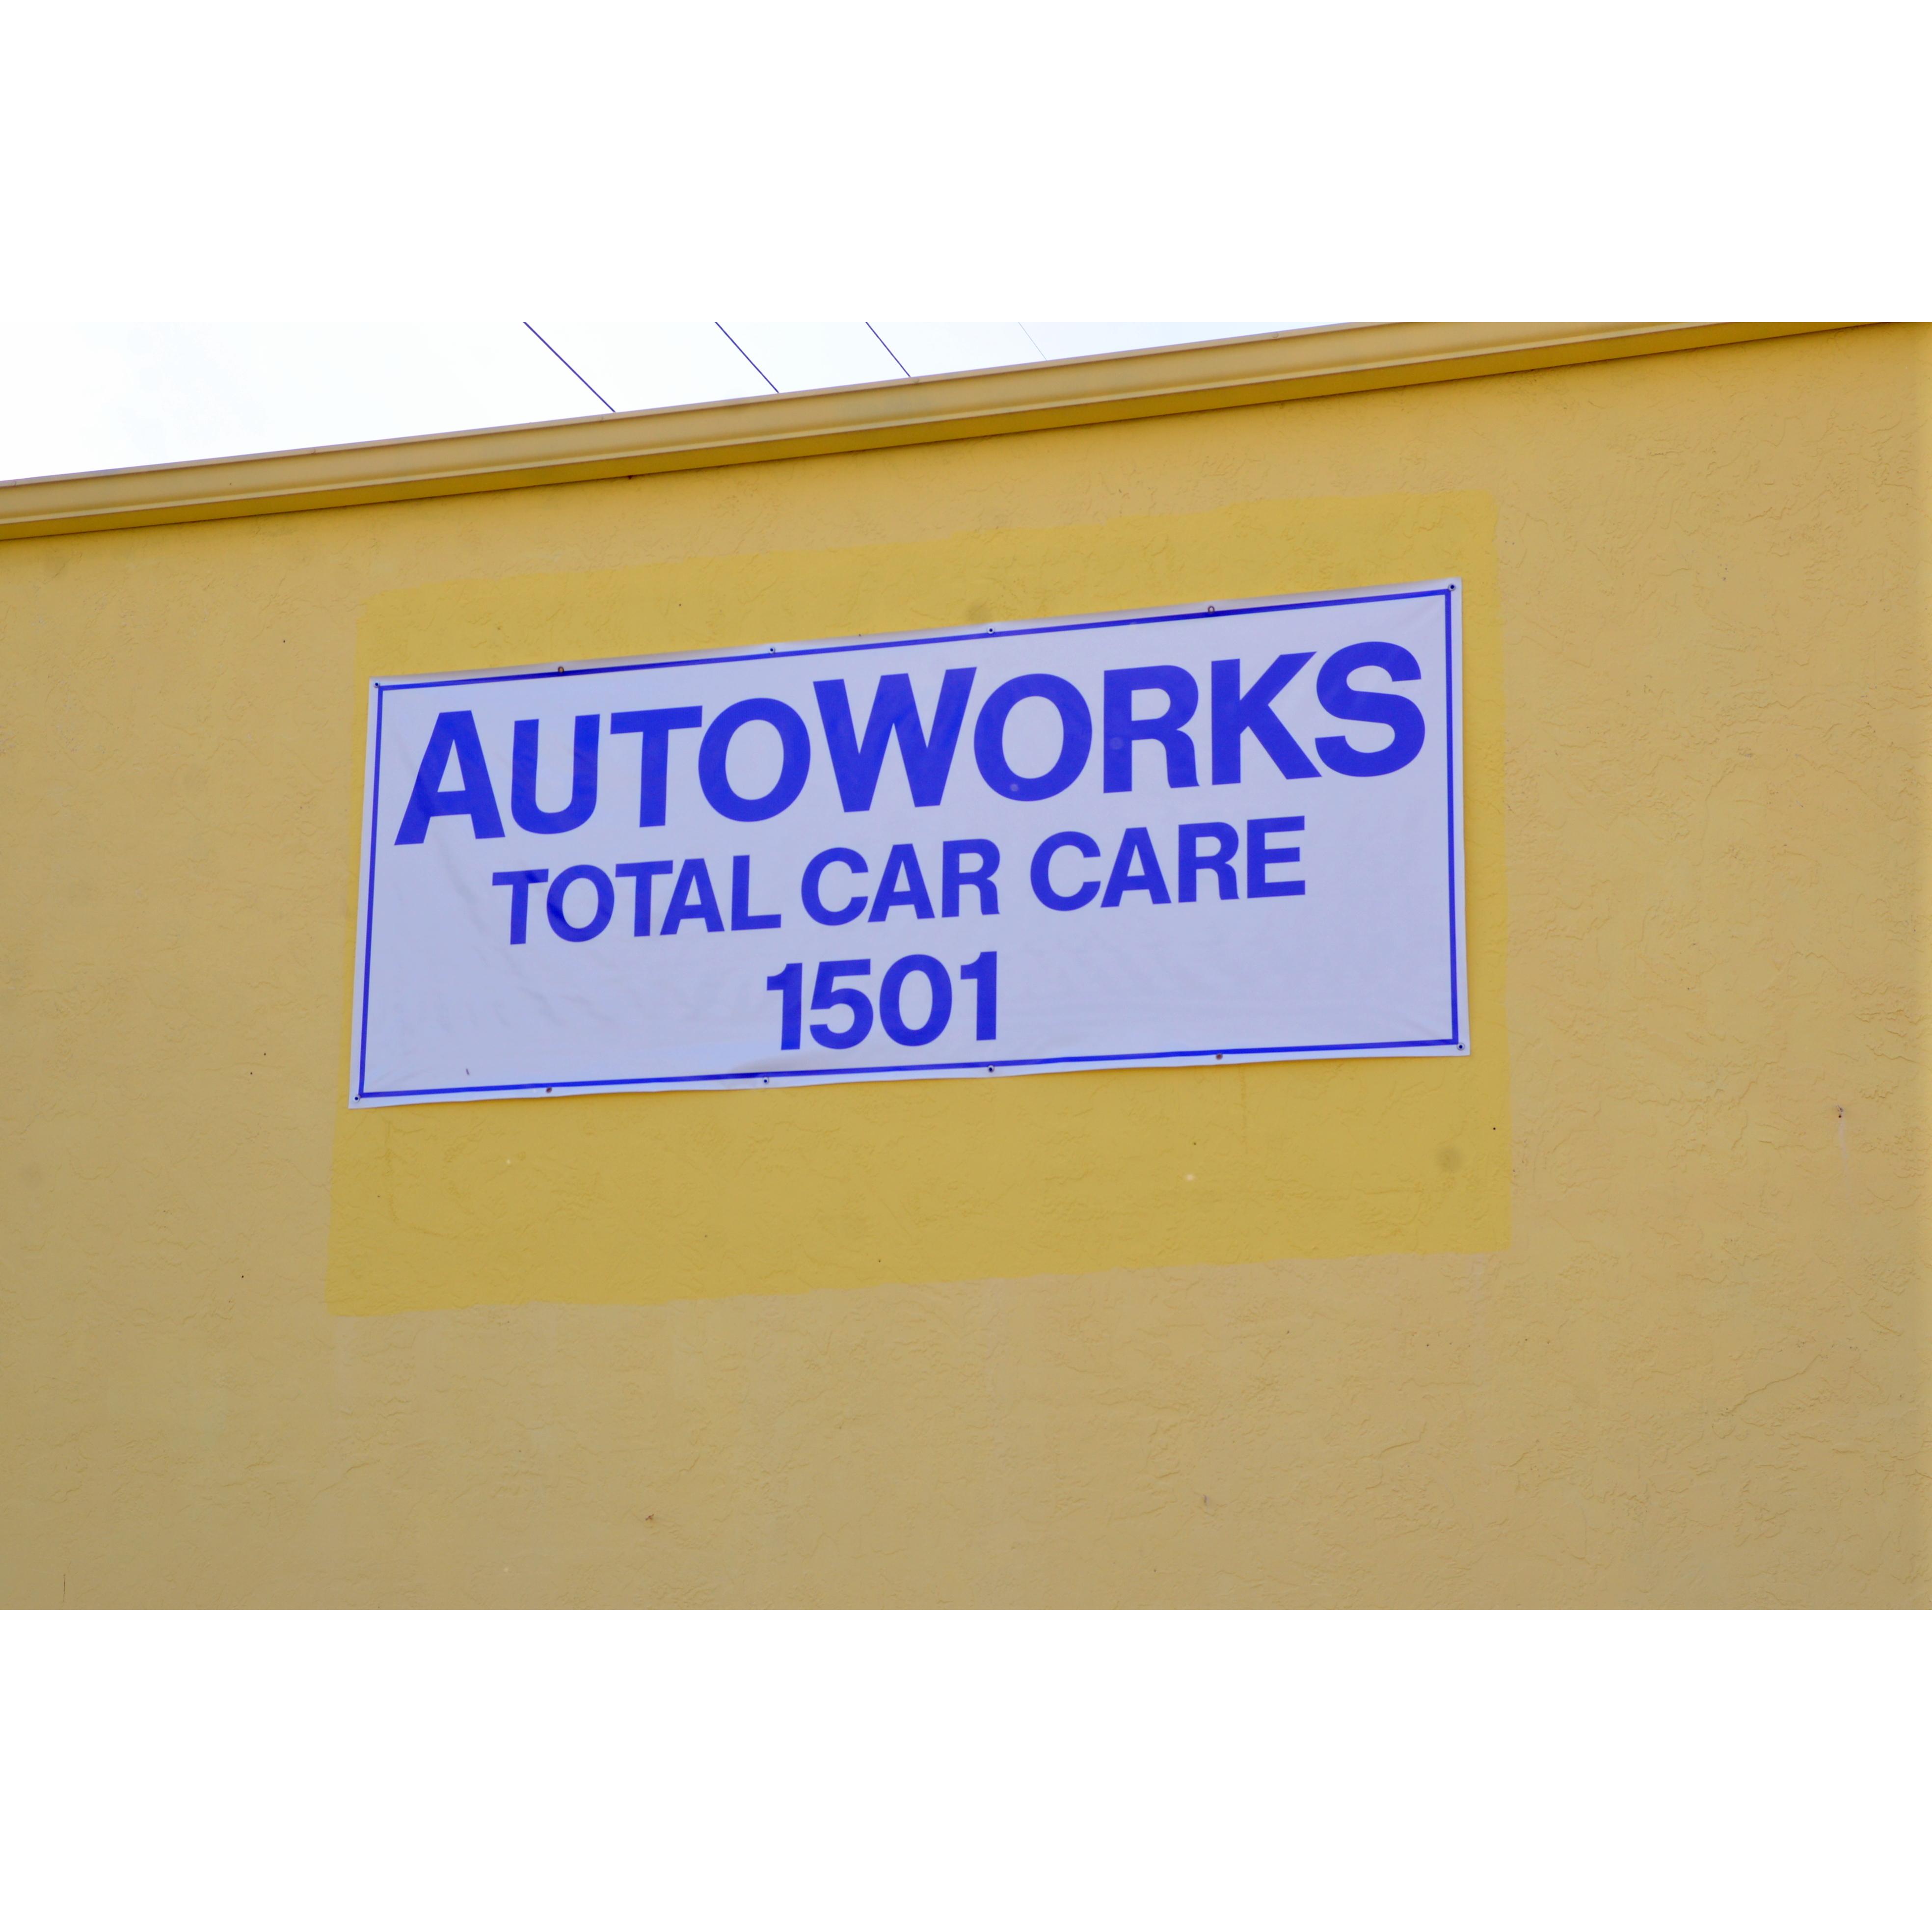 AutoWorks - Delray Beach, FL - General Auto Repair & Service